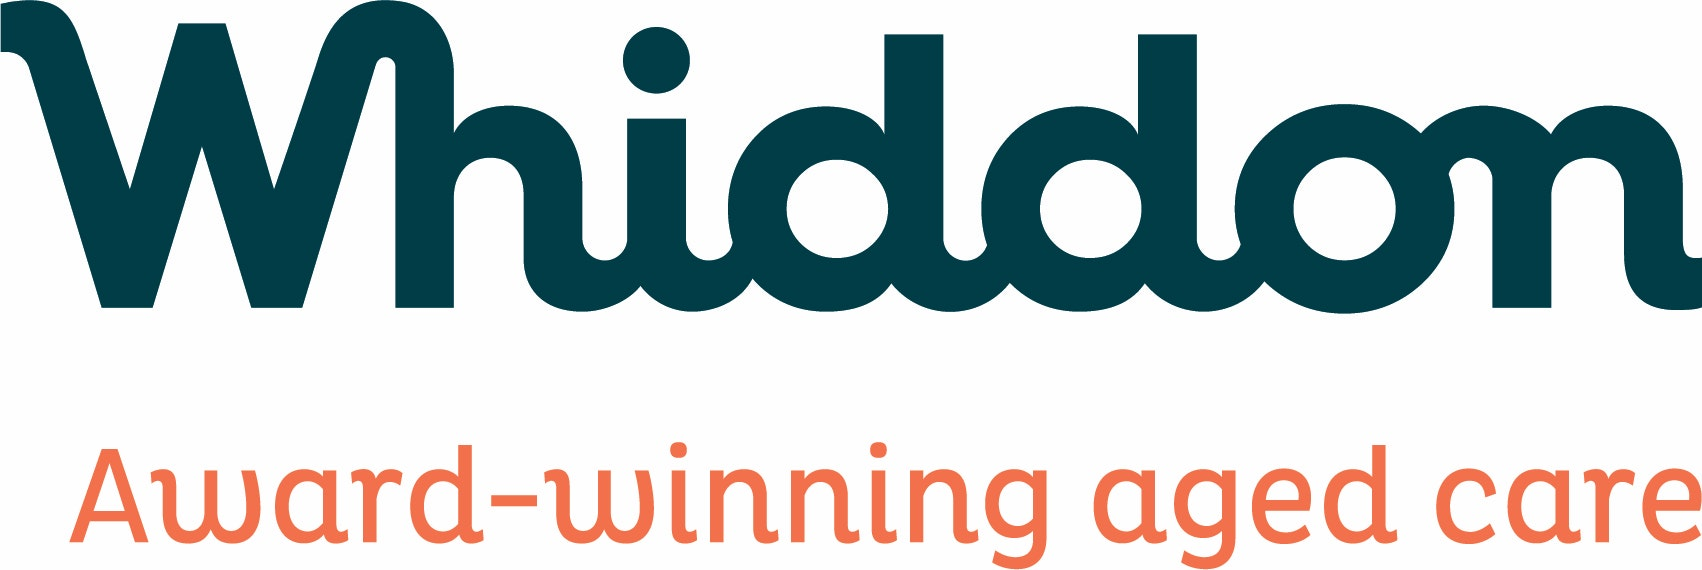 Whiddon Narrabri Robert Young logo